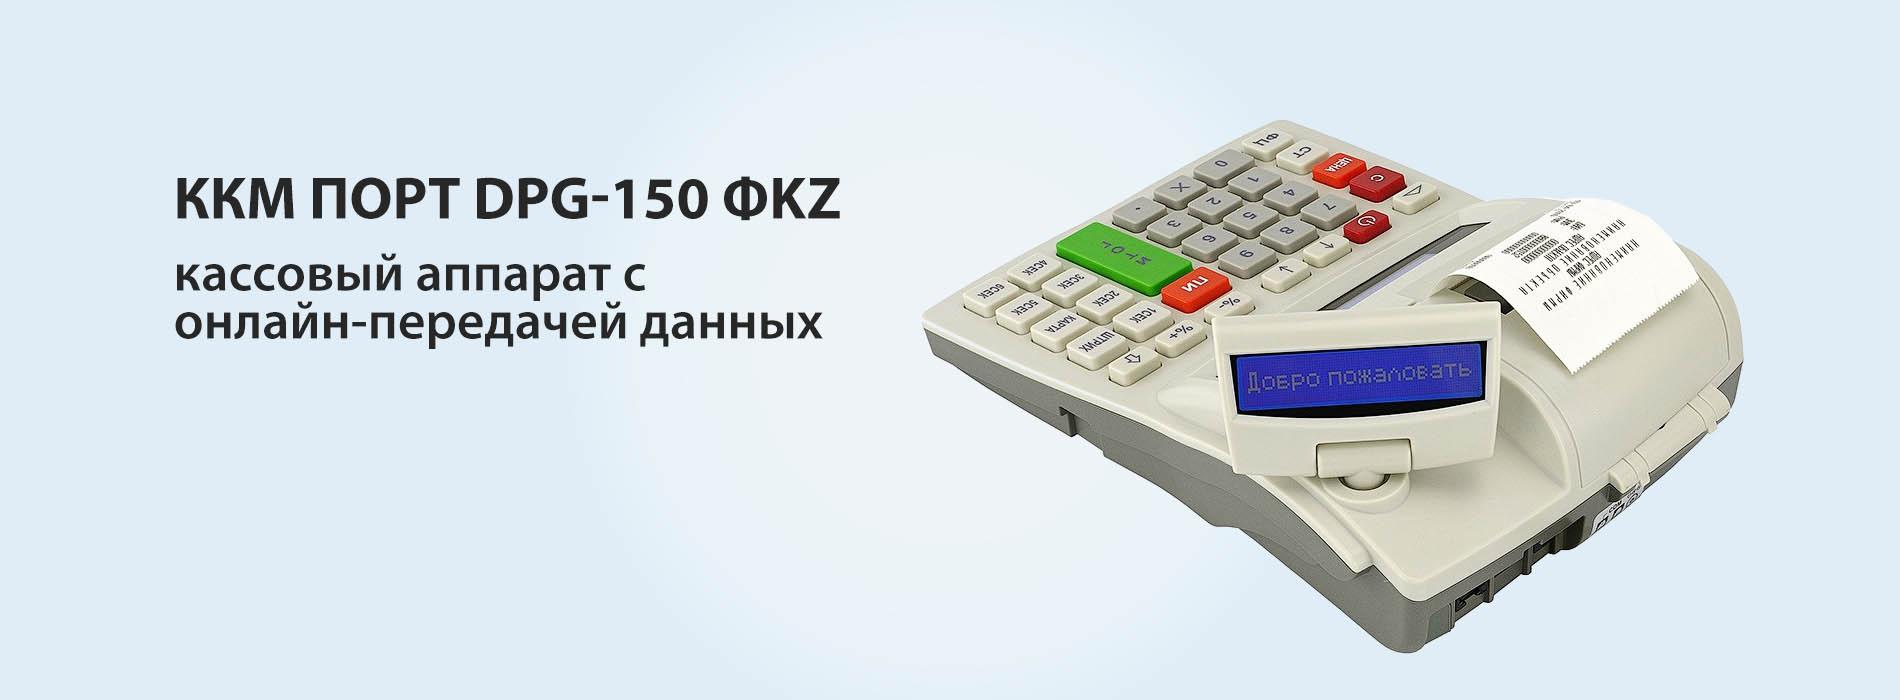 ККМ ПОРТ DPG-150 ФKZ